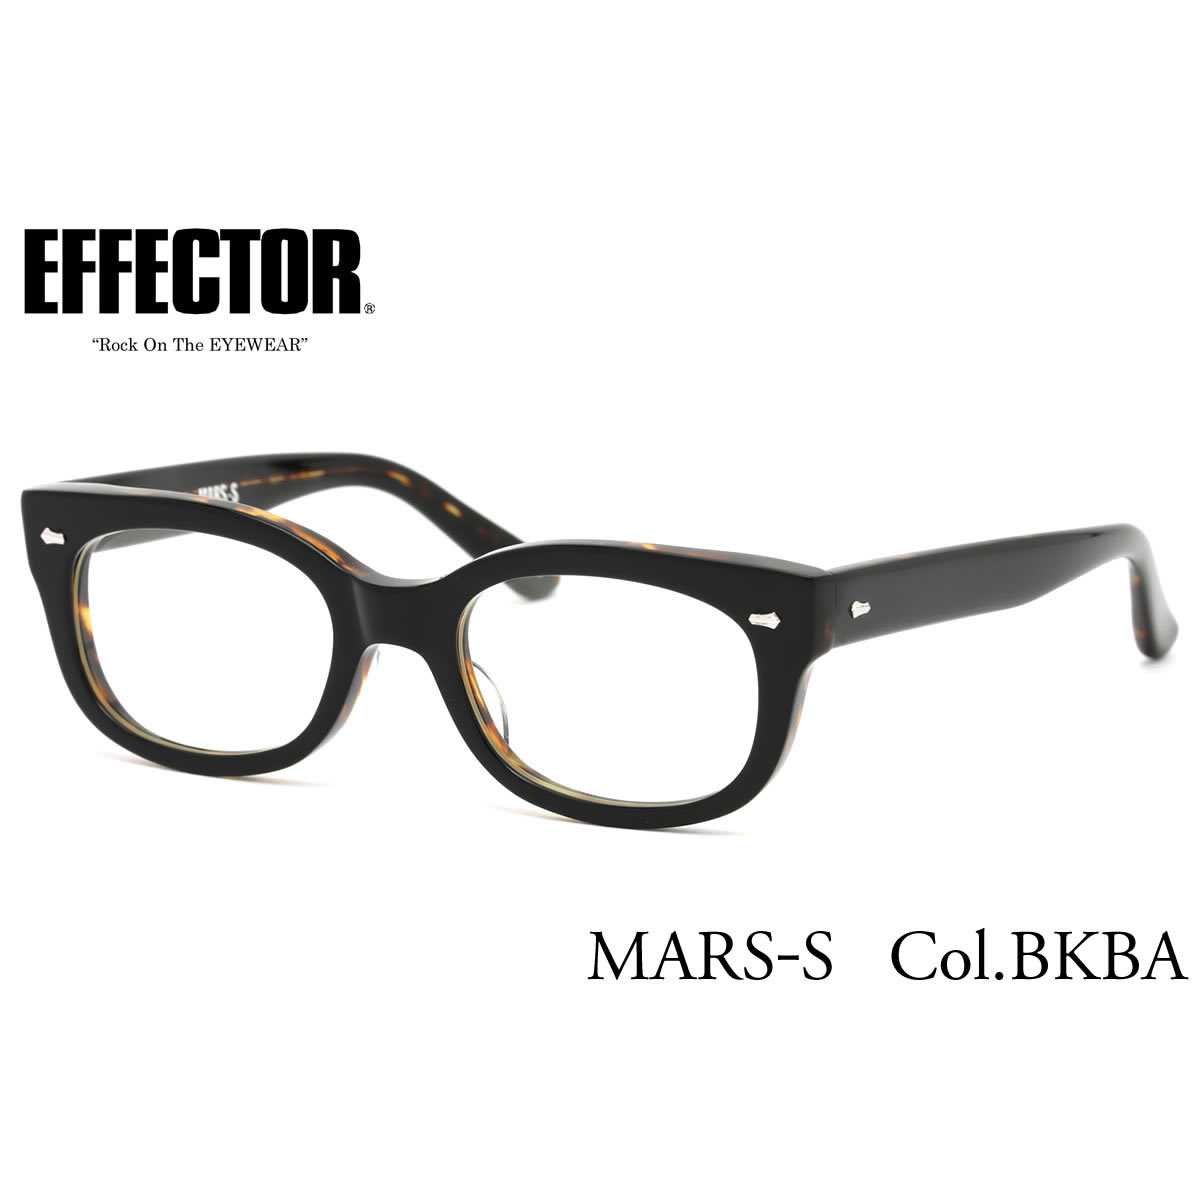 【EFFECTOR】エフェクター 眼鏡 メガネ フレーム MARS-S BKBA 50サイズ エフェクター EFFECTOR マーズ エス UVカット仕様伊達メガネレンズ付 日本製 メンズ レディース